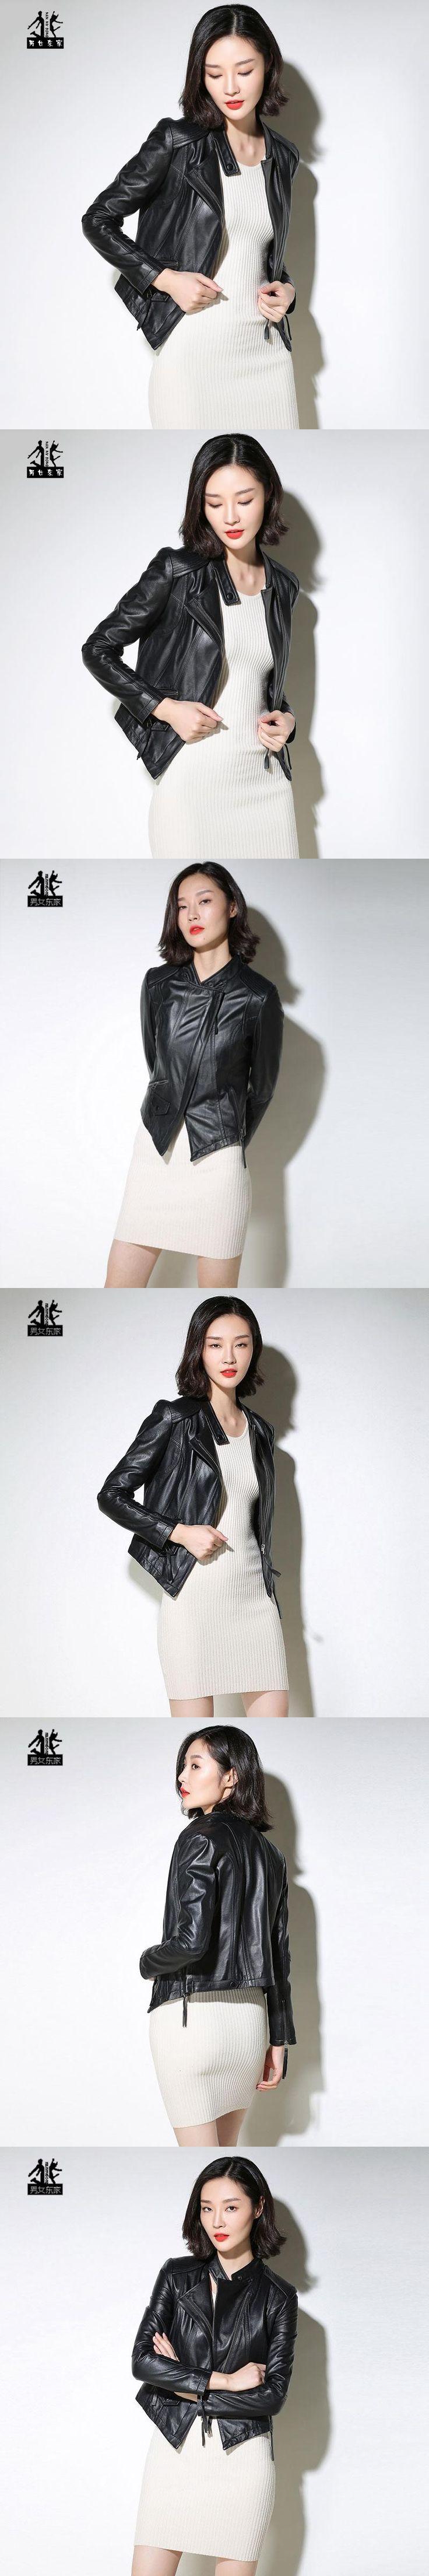 2017 Black Genuine Leather Coat Women Stand Collar Slim Fit Fashion Popular Real Sheepskin Female Leather Jacket FREE SHIPPING